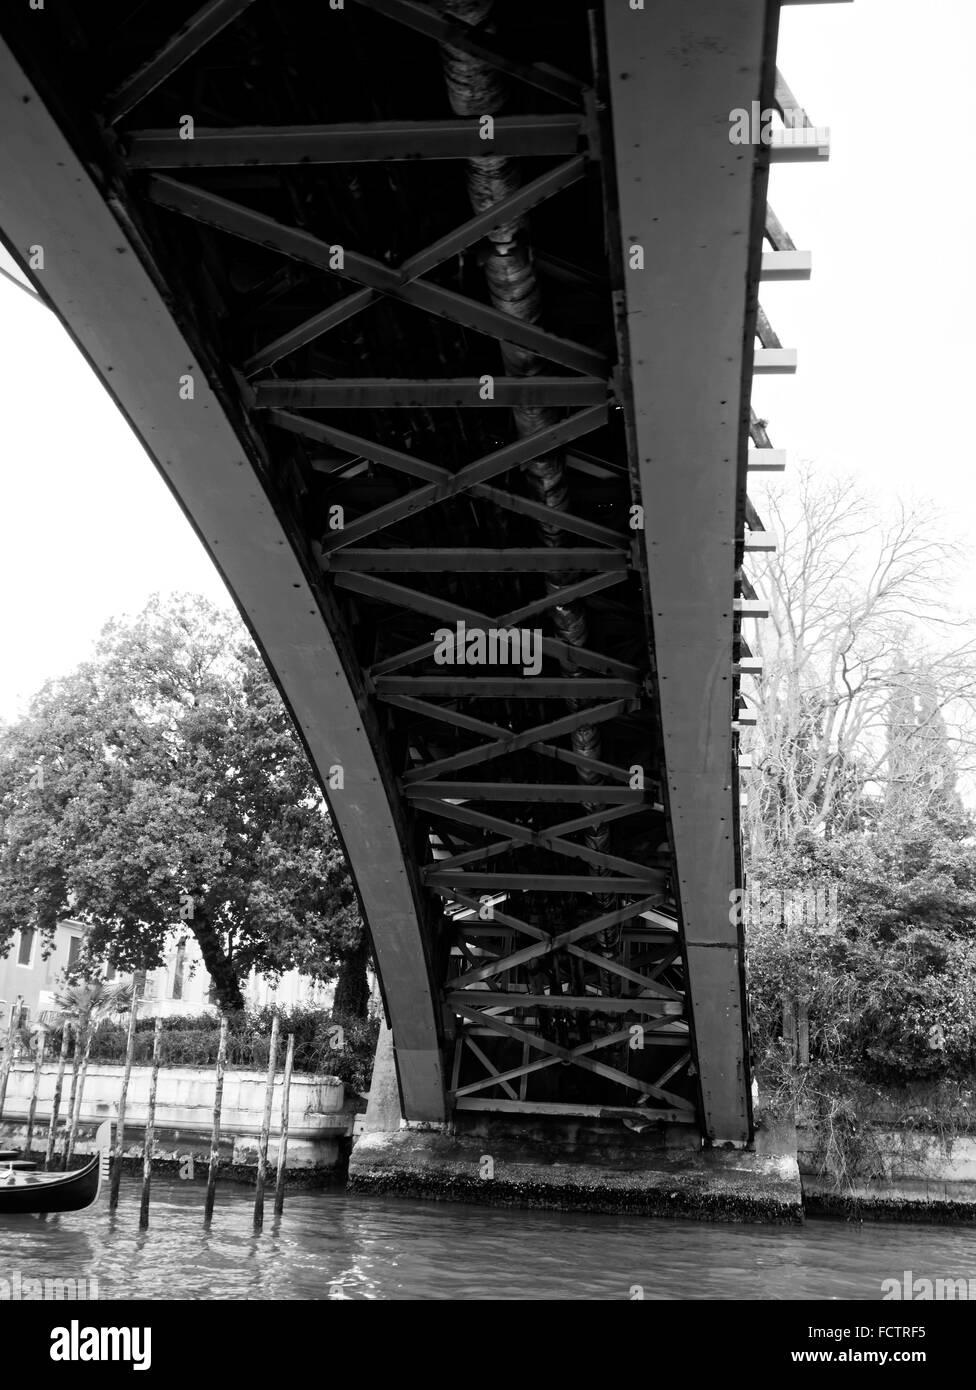 Academia bridge over Grand Canal, Venice, Italy - Stock Image